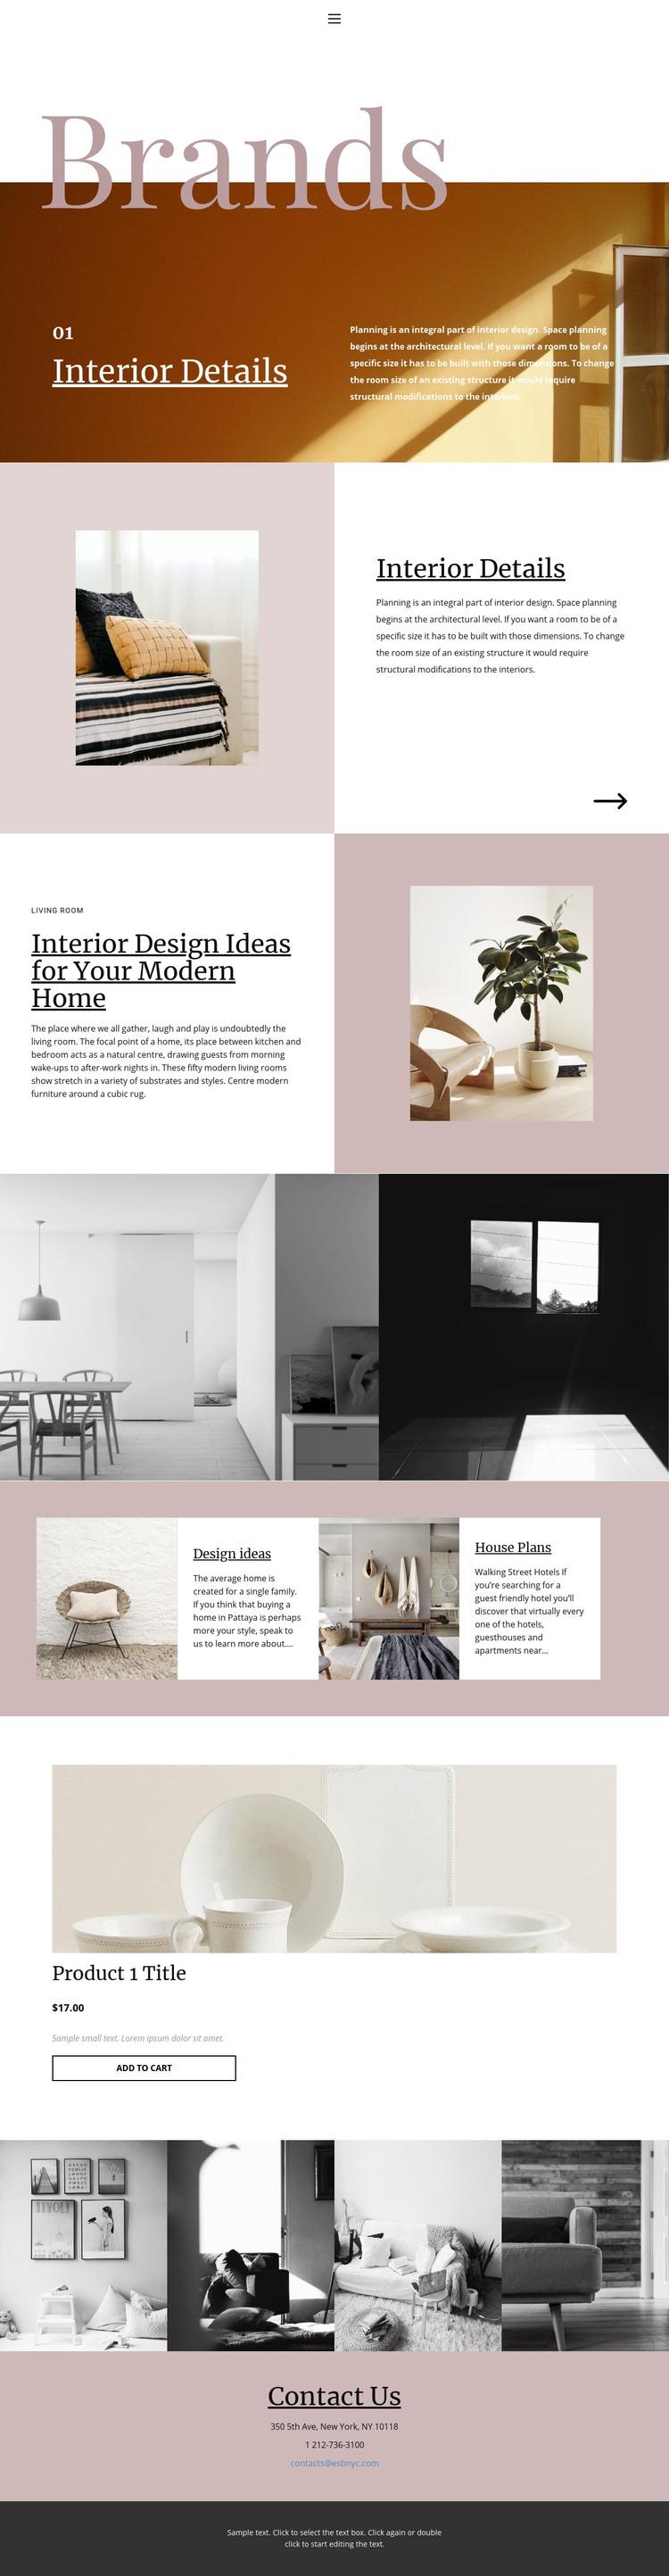 I am an interior designer Homepage Design